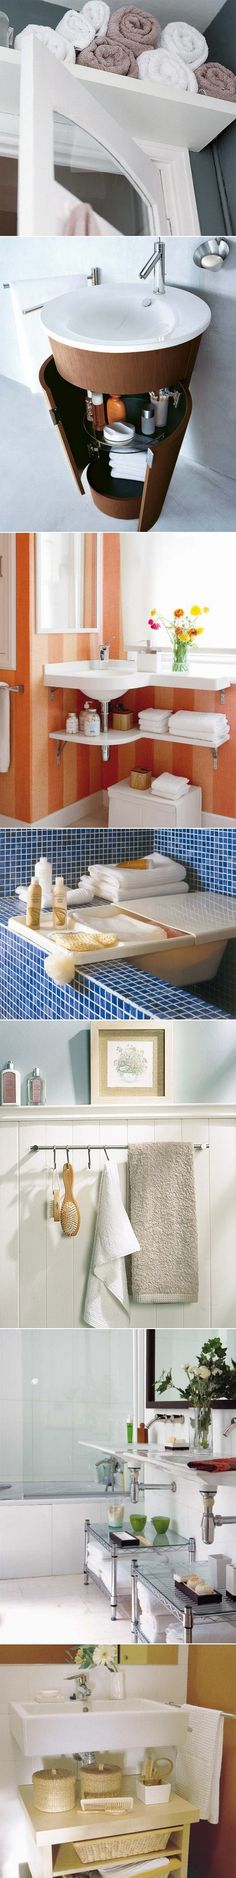 DIY Small Bathroom storage ideas. Take away SHELF ABOVE DOORS. Seen this often…